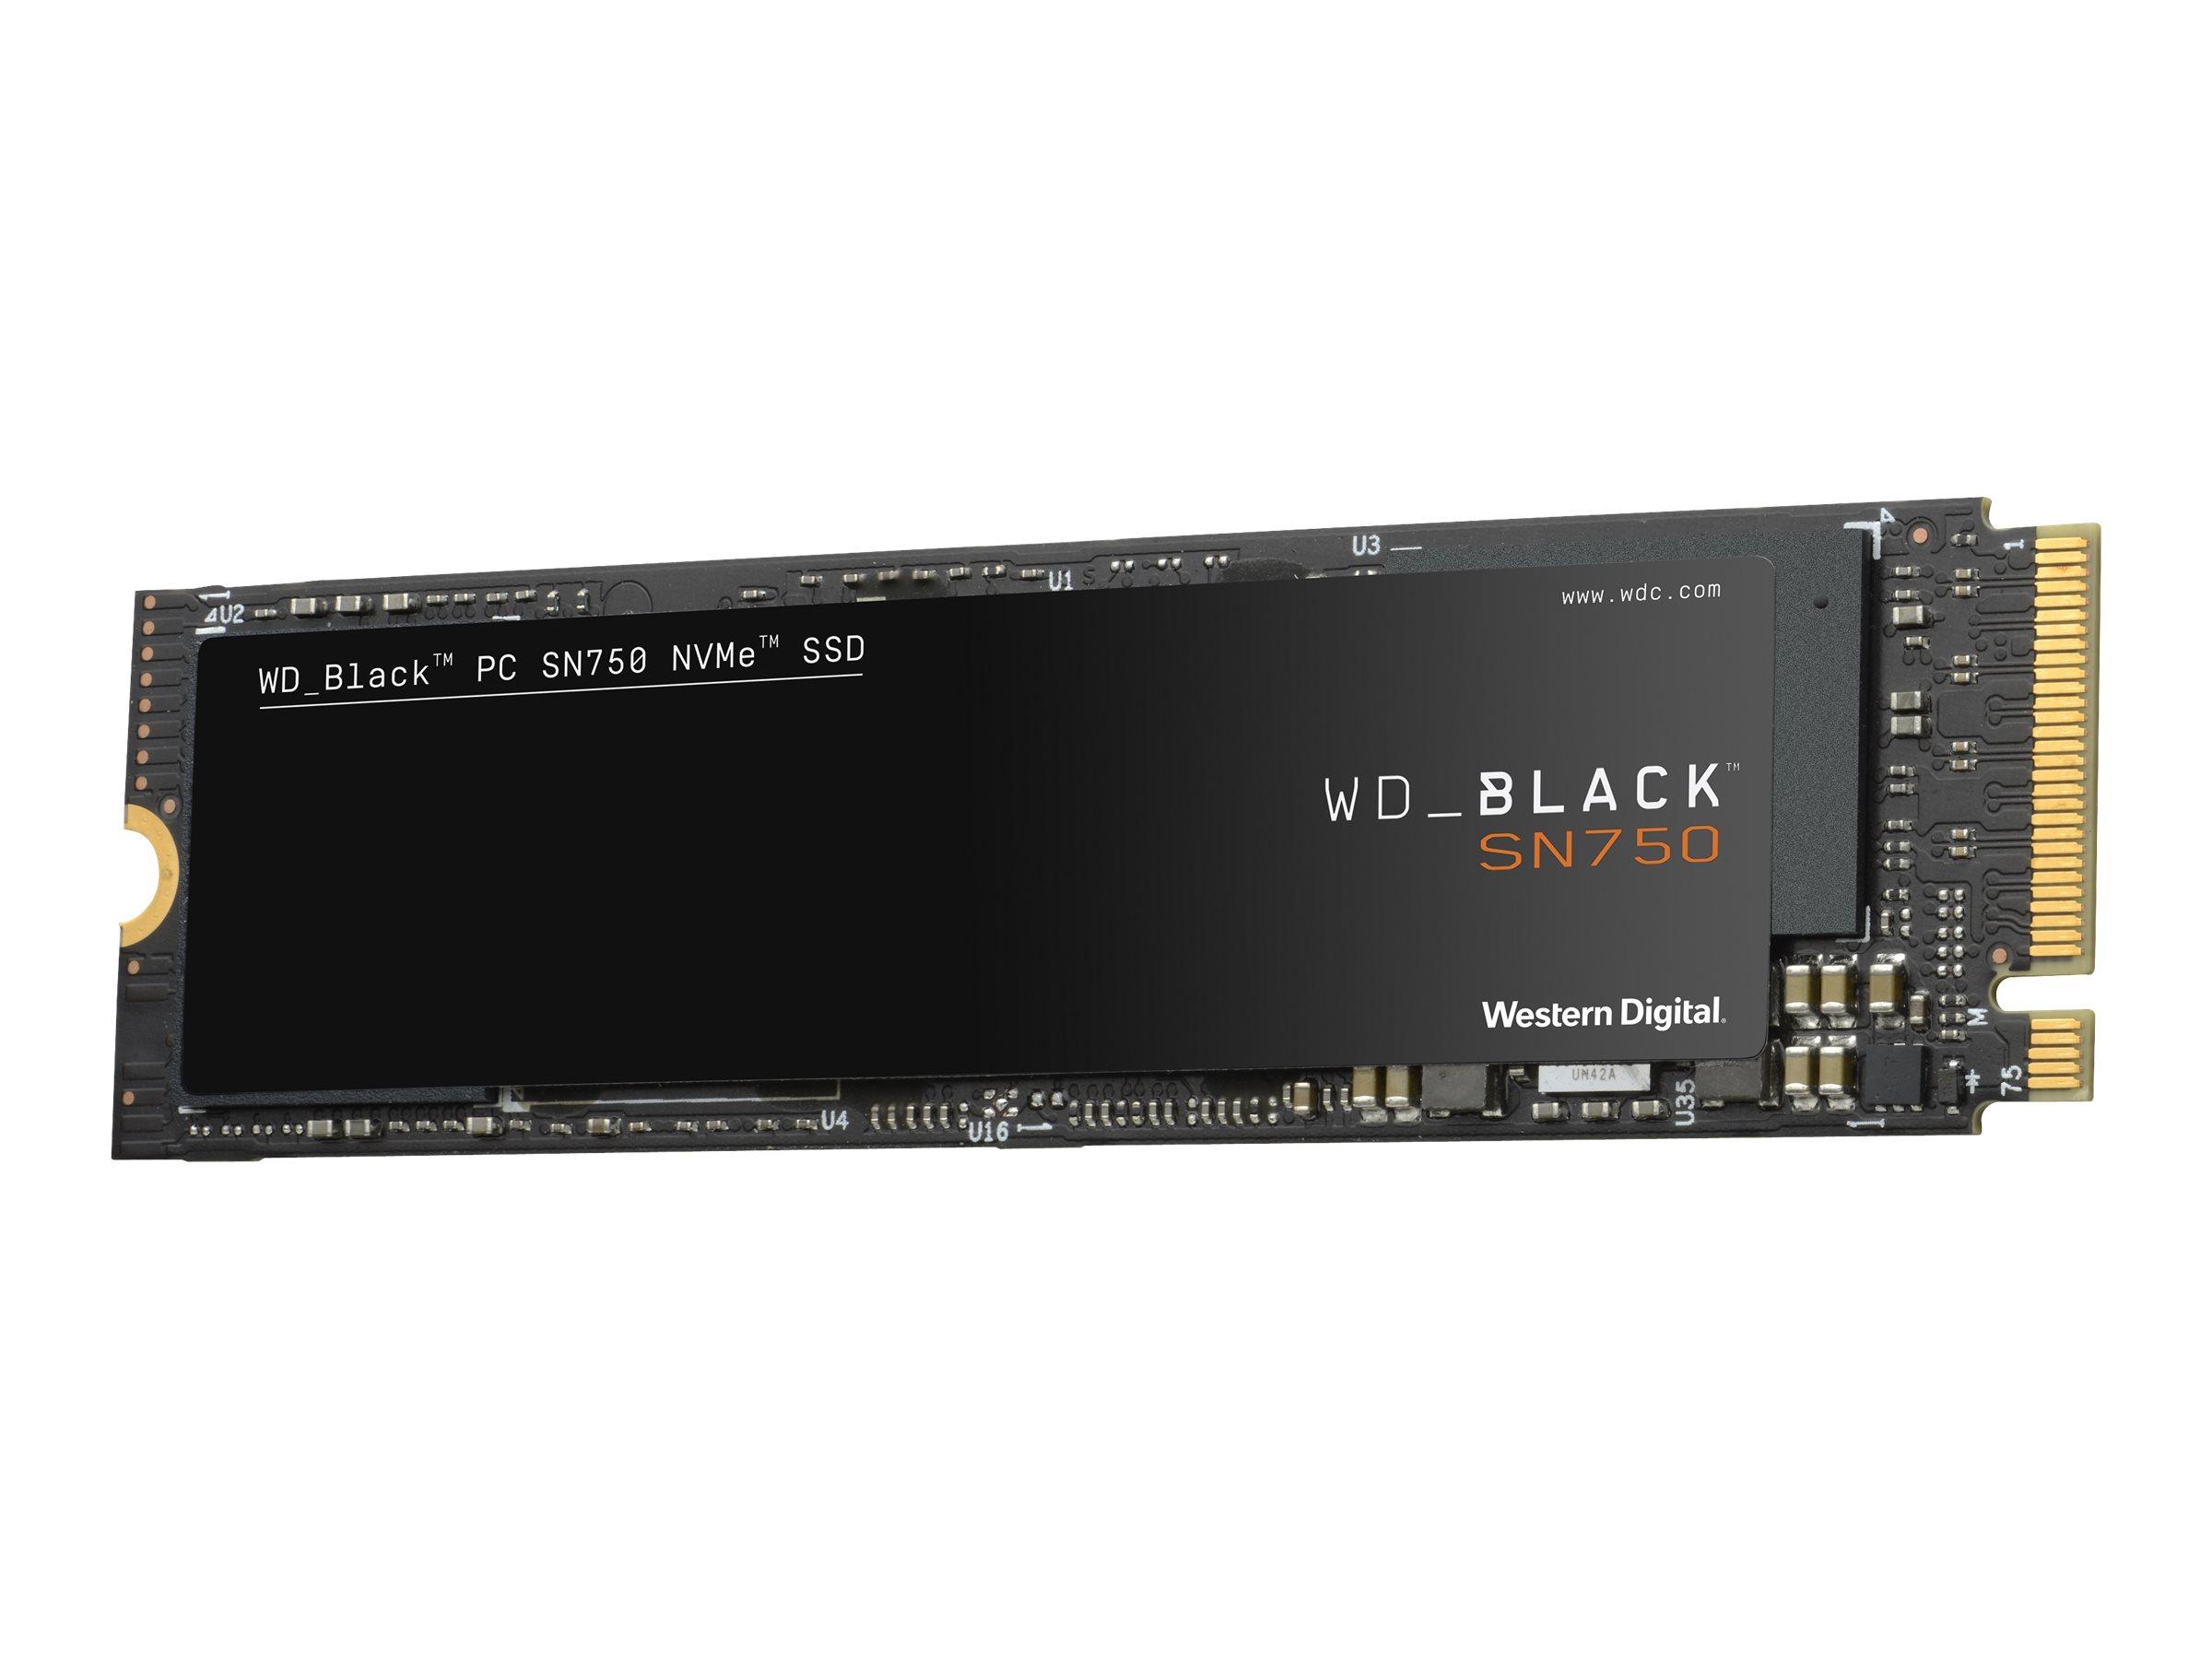 Wd black sn750 nvme ssd wds200t3x0c solid state disk 2 tb intern m 2 2280 pci express 3 0 x4 nvme 10982192 wds200t3x0c